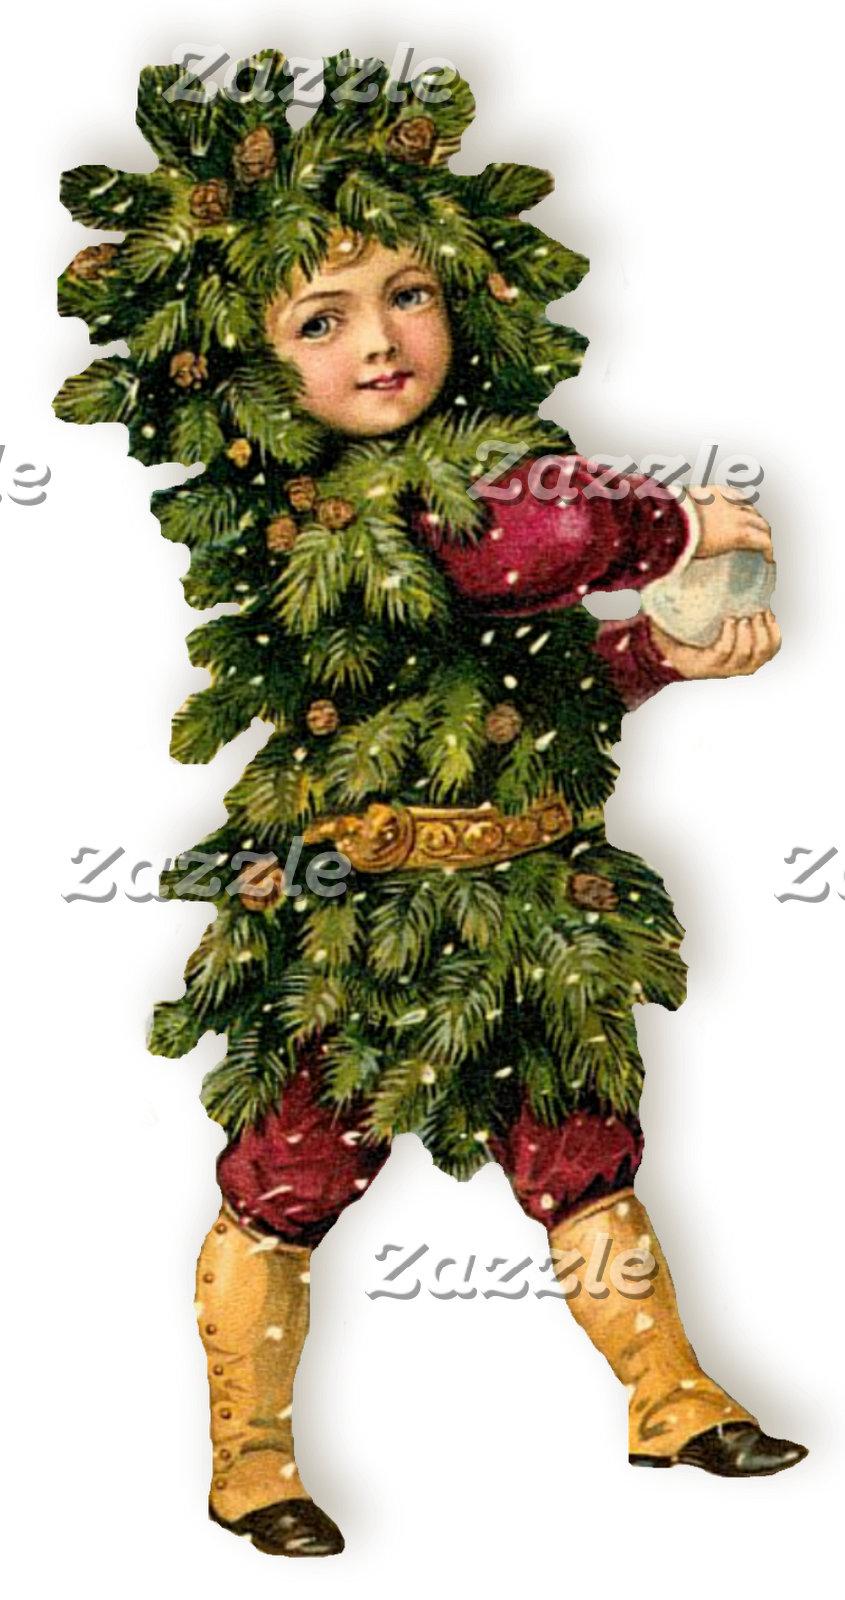 an irreverent christmas